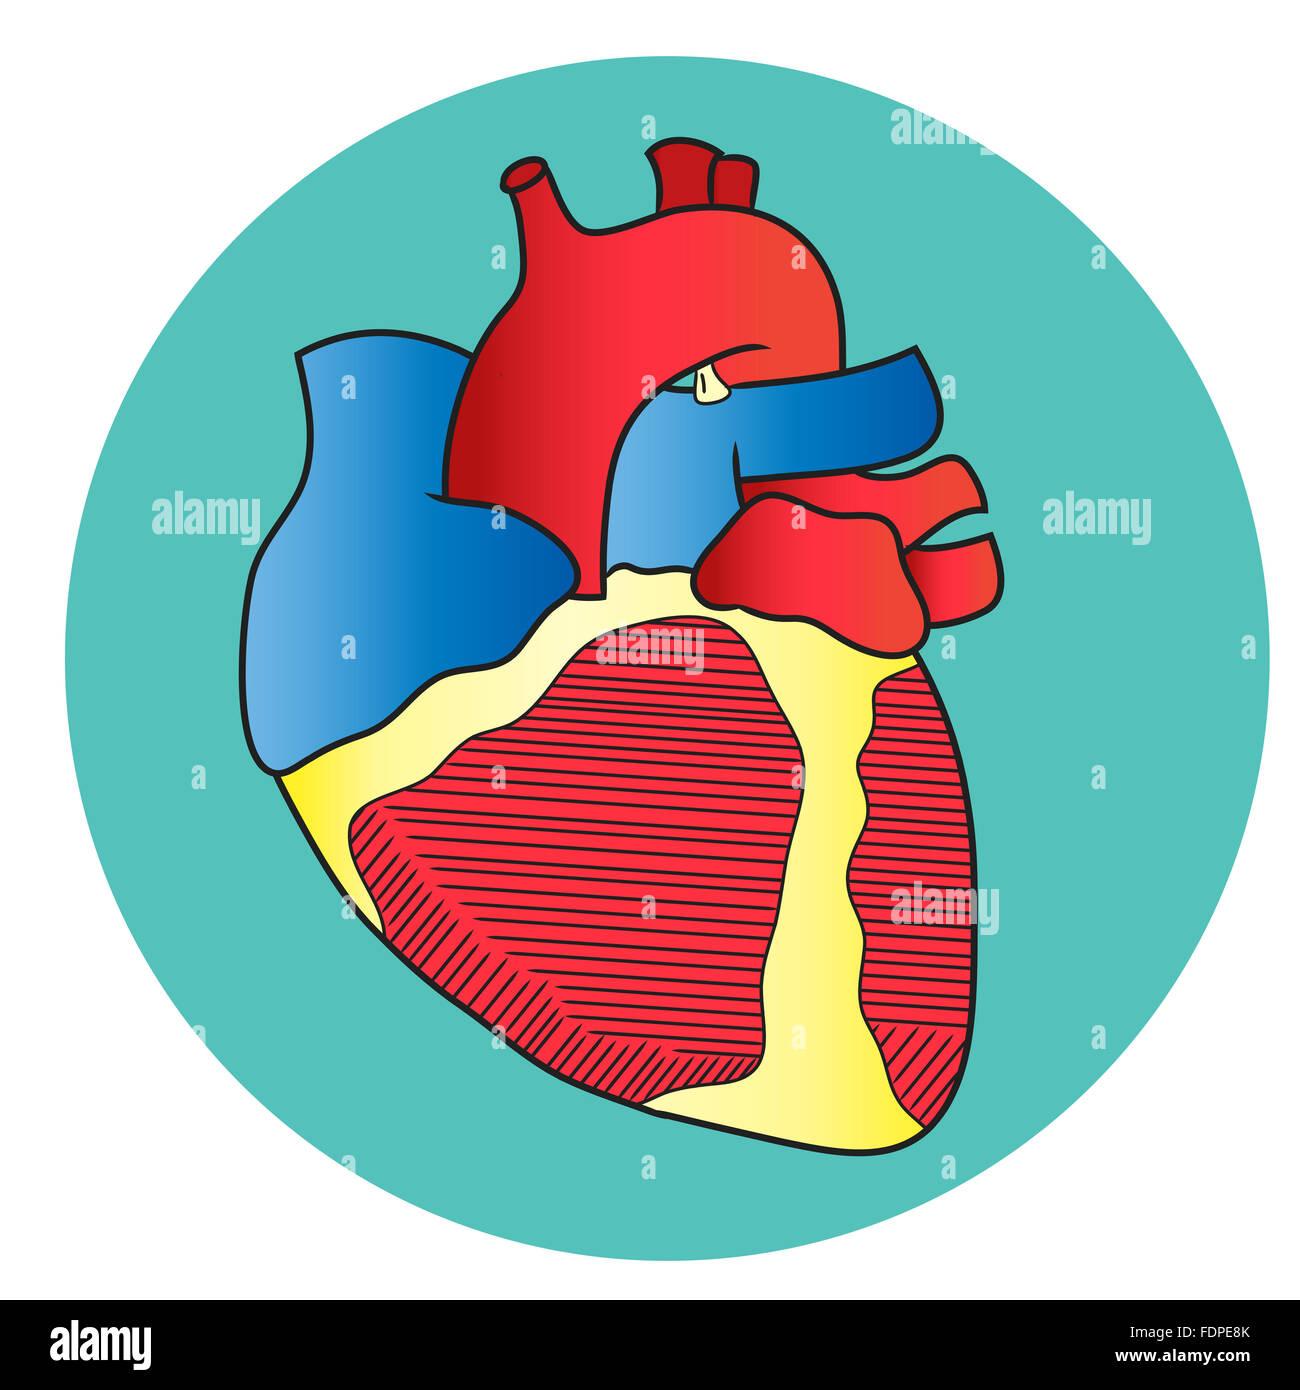 Anatomy of the Heart- Anterior View Stock Photo: 94536531 - Alamy